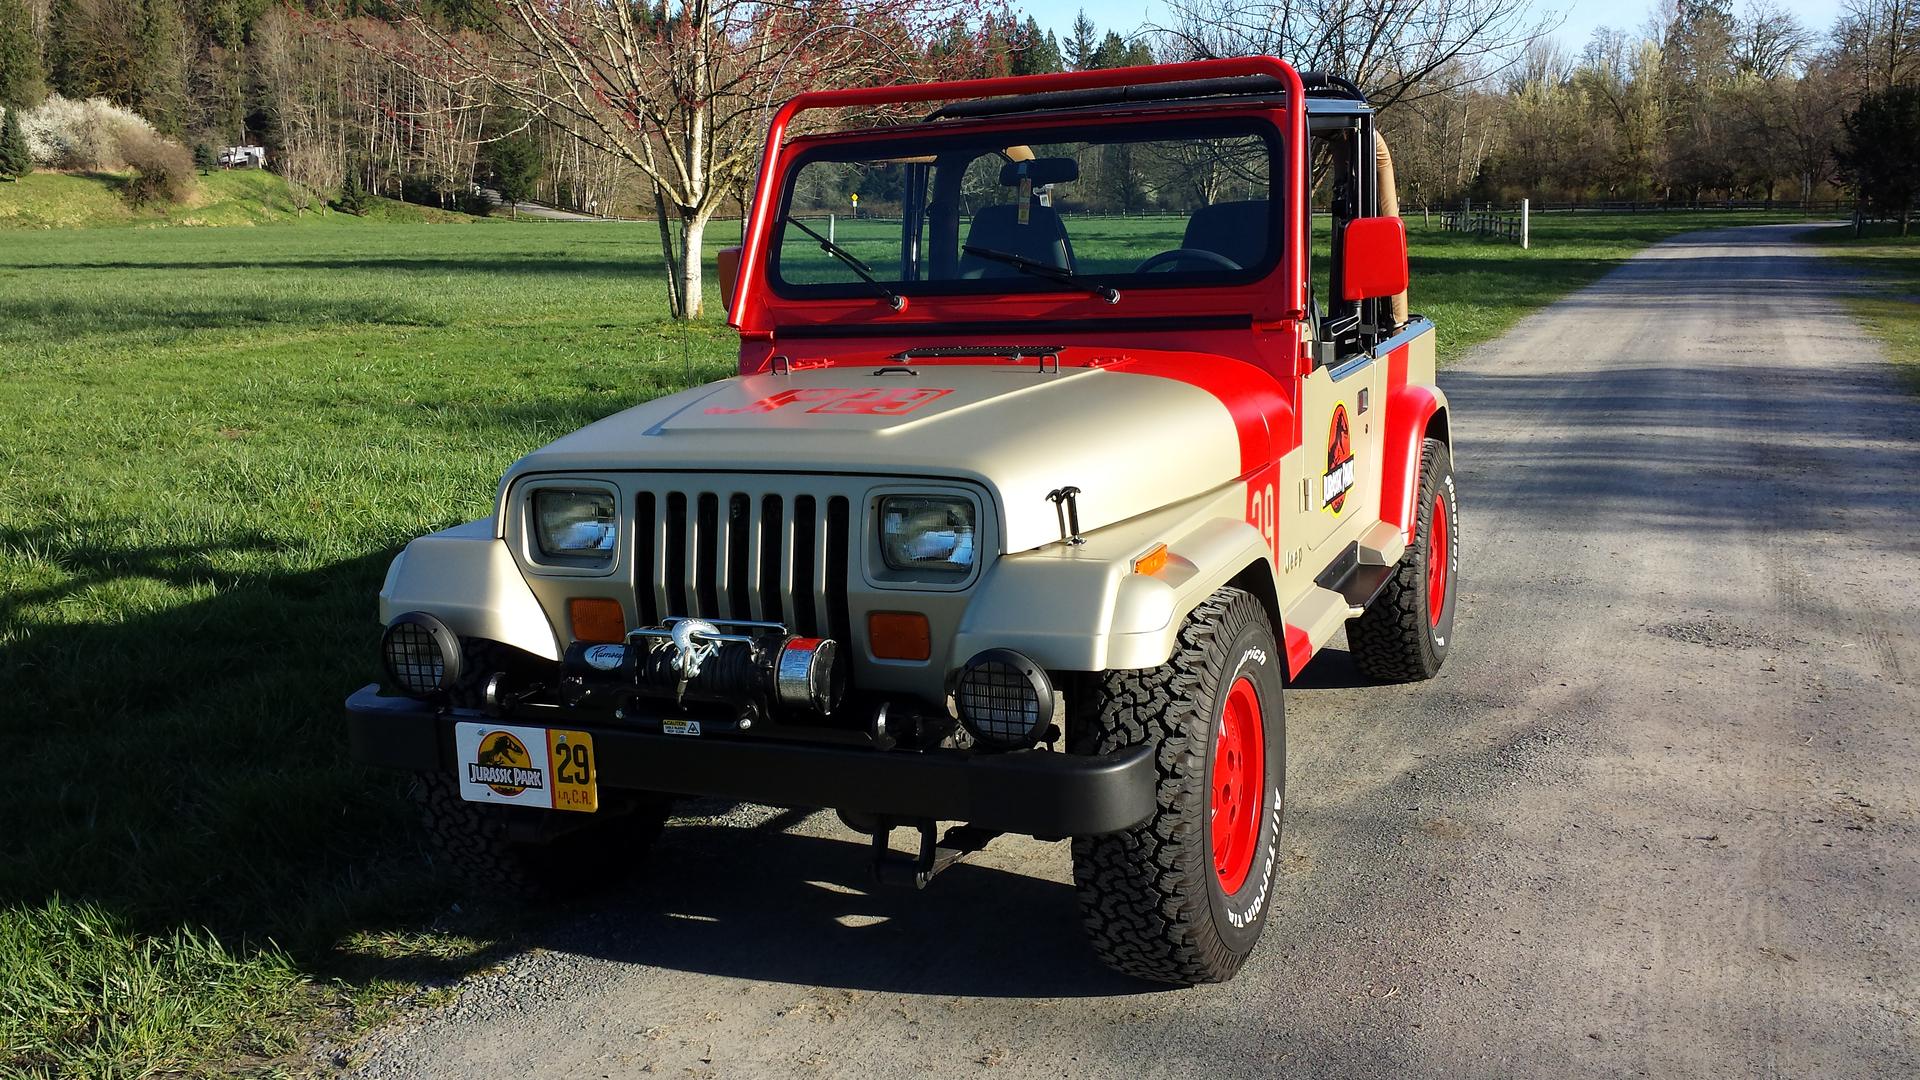 on damage showthread sale jpjeepleft advice jurassic nasioc for park forums jeep dino